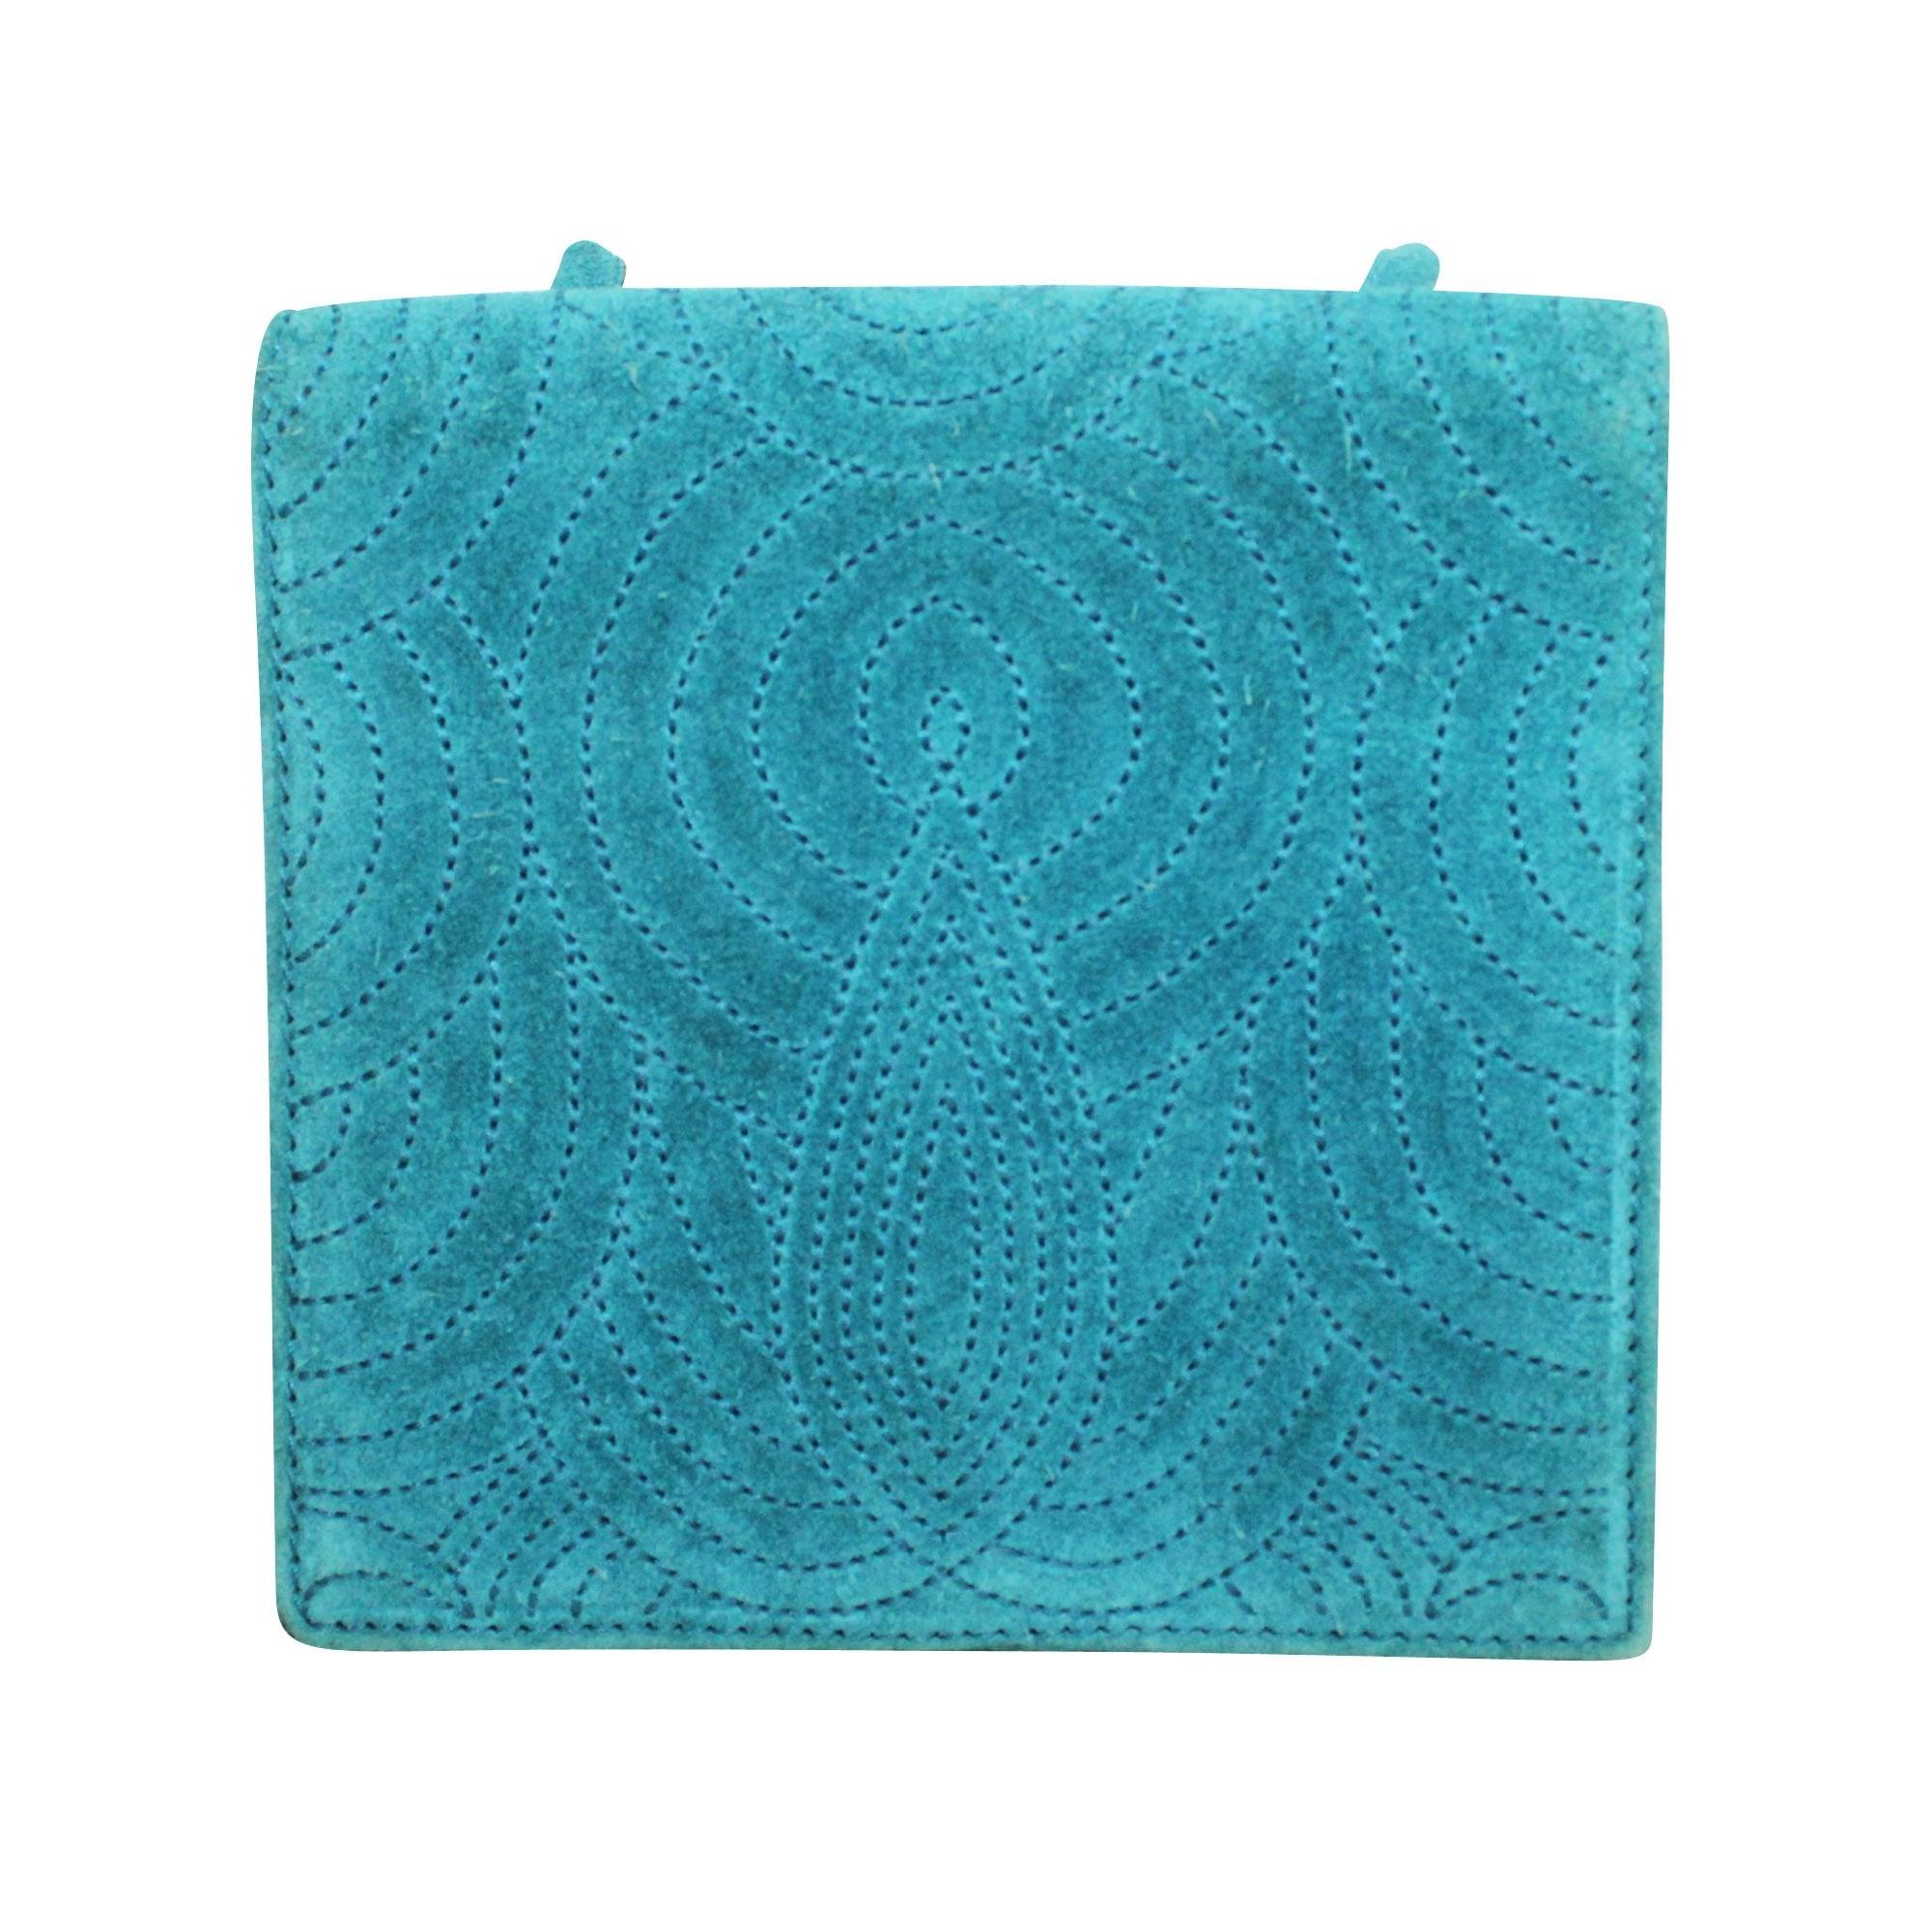 Sac en bandoulière en cuir YVES SAINT LAURENT Bleu, bleu marine, bleu turquoise